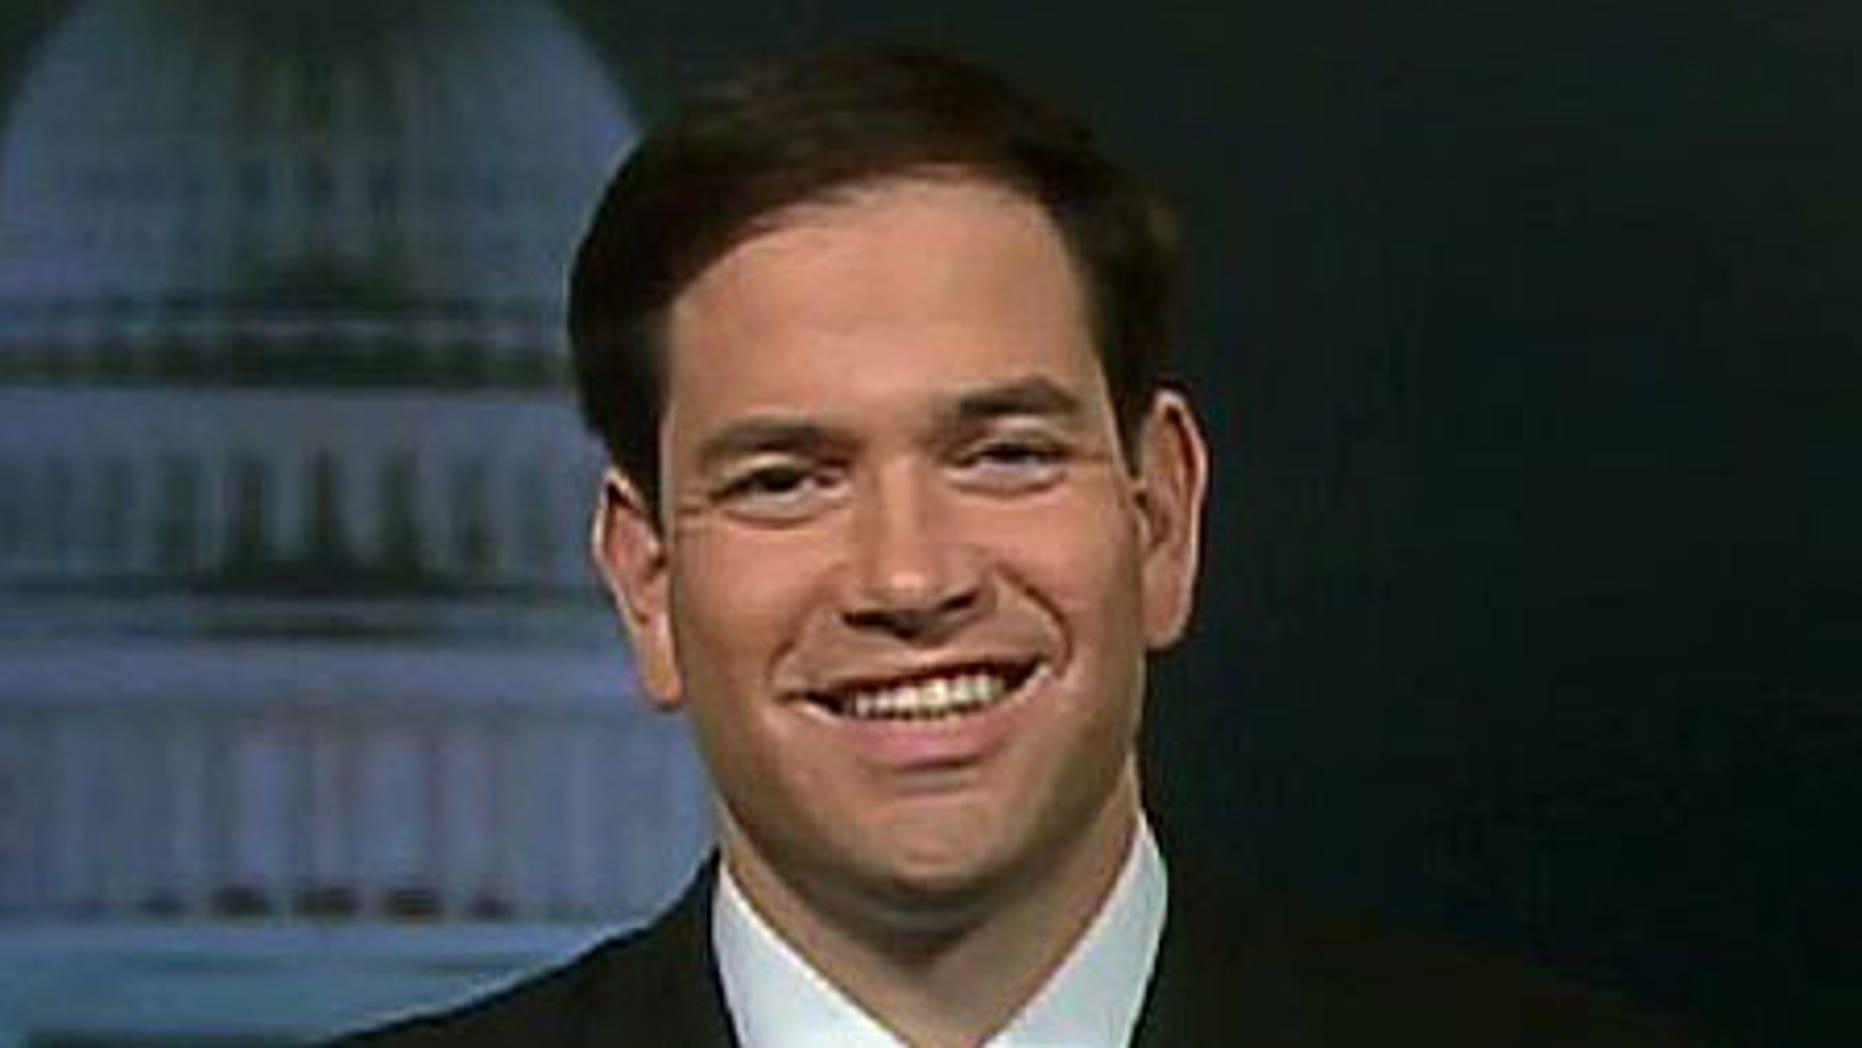 Florida Senatorial Candidate Marco Rubio